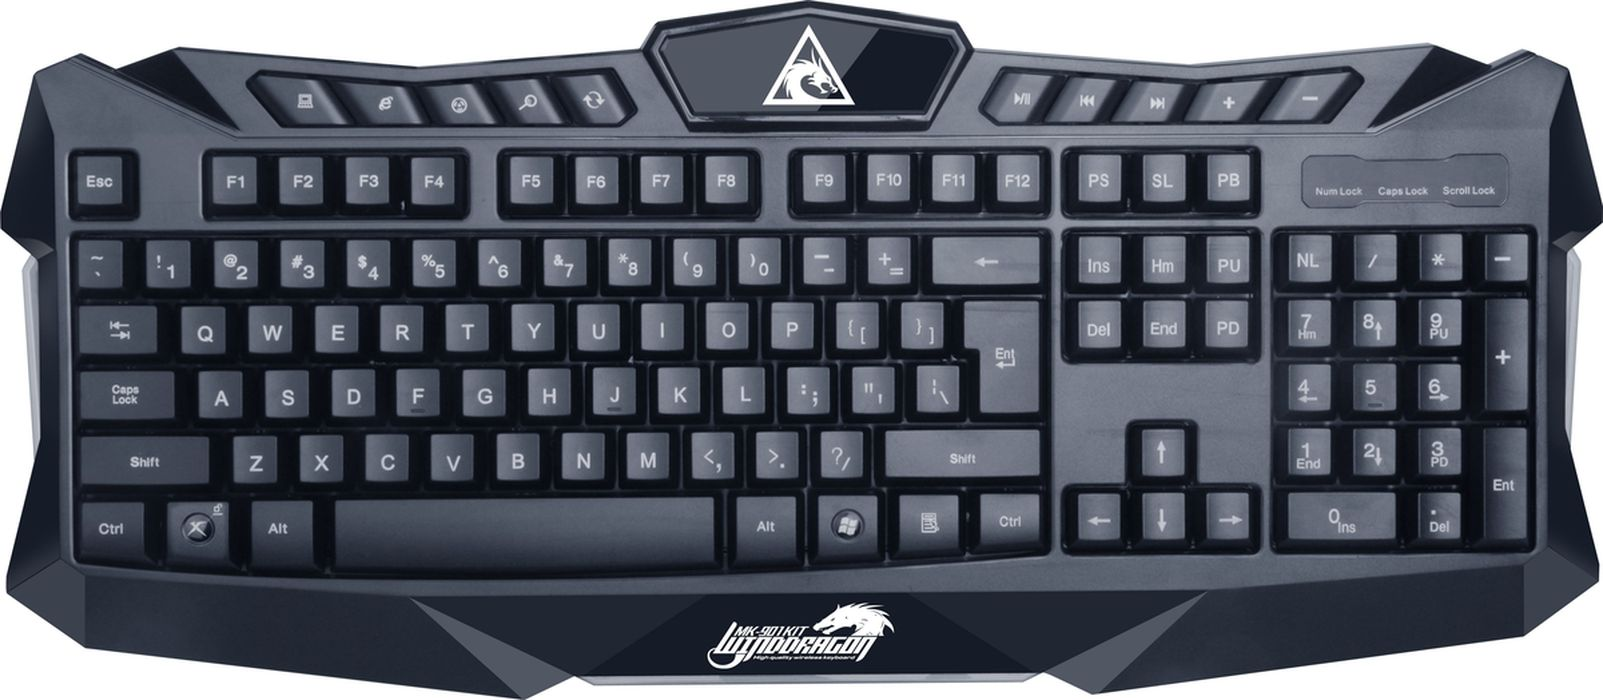 Комплект игровая мышь + клавиатура Xtrike Me MK-901KIT, Black